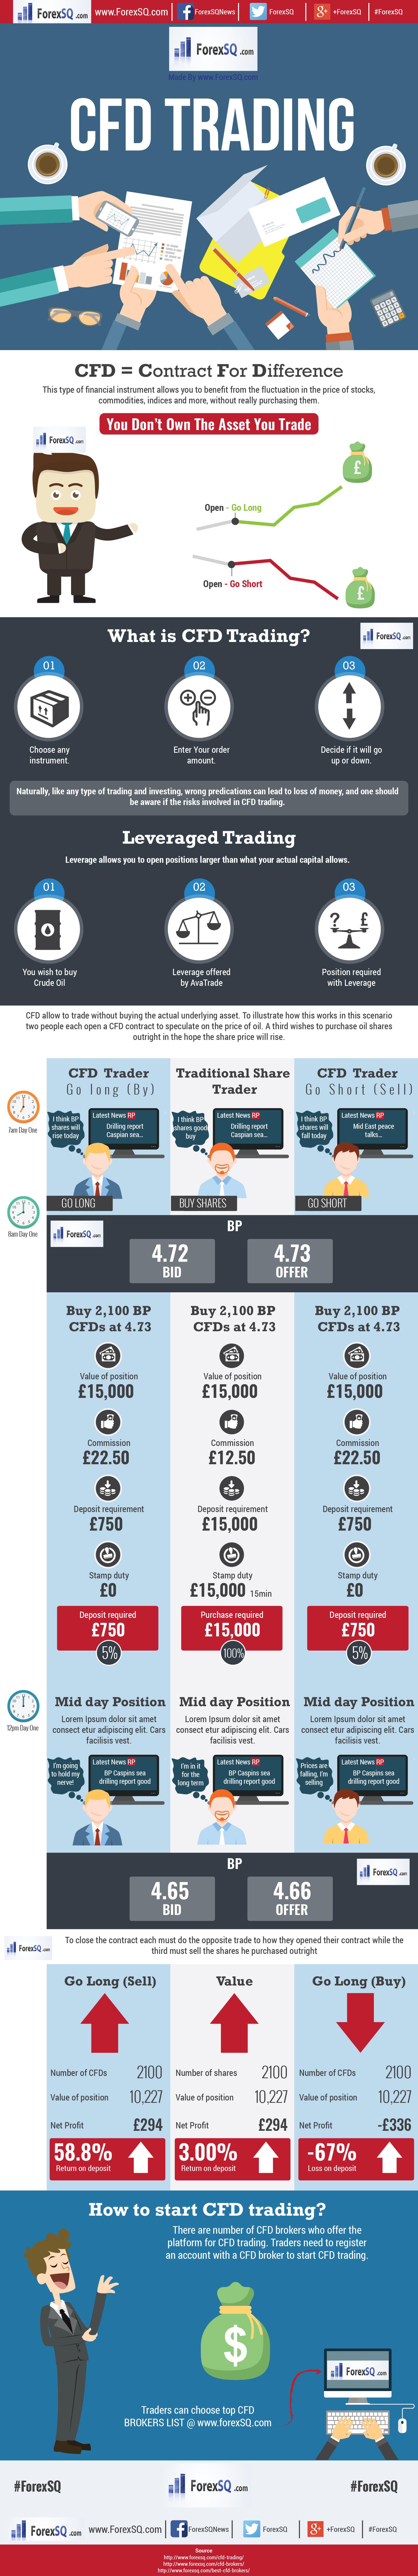 What is the best online brokerage?